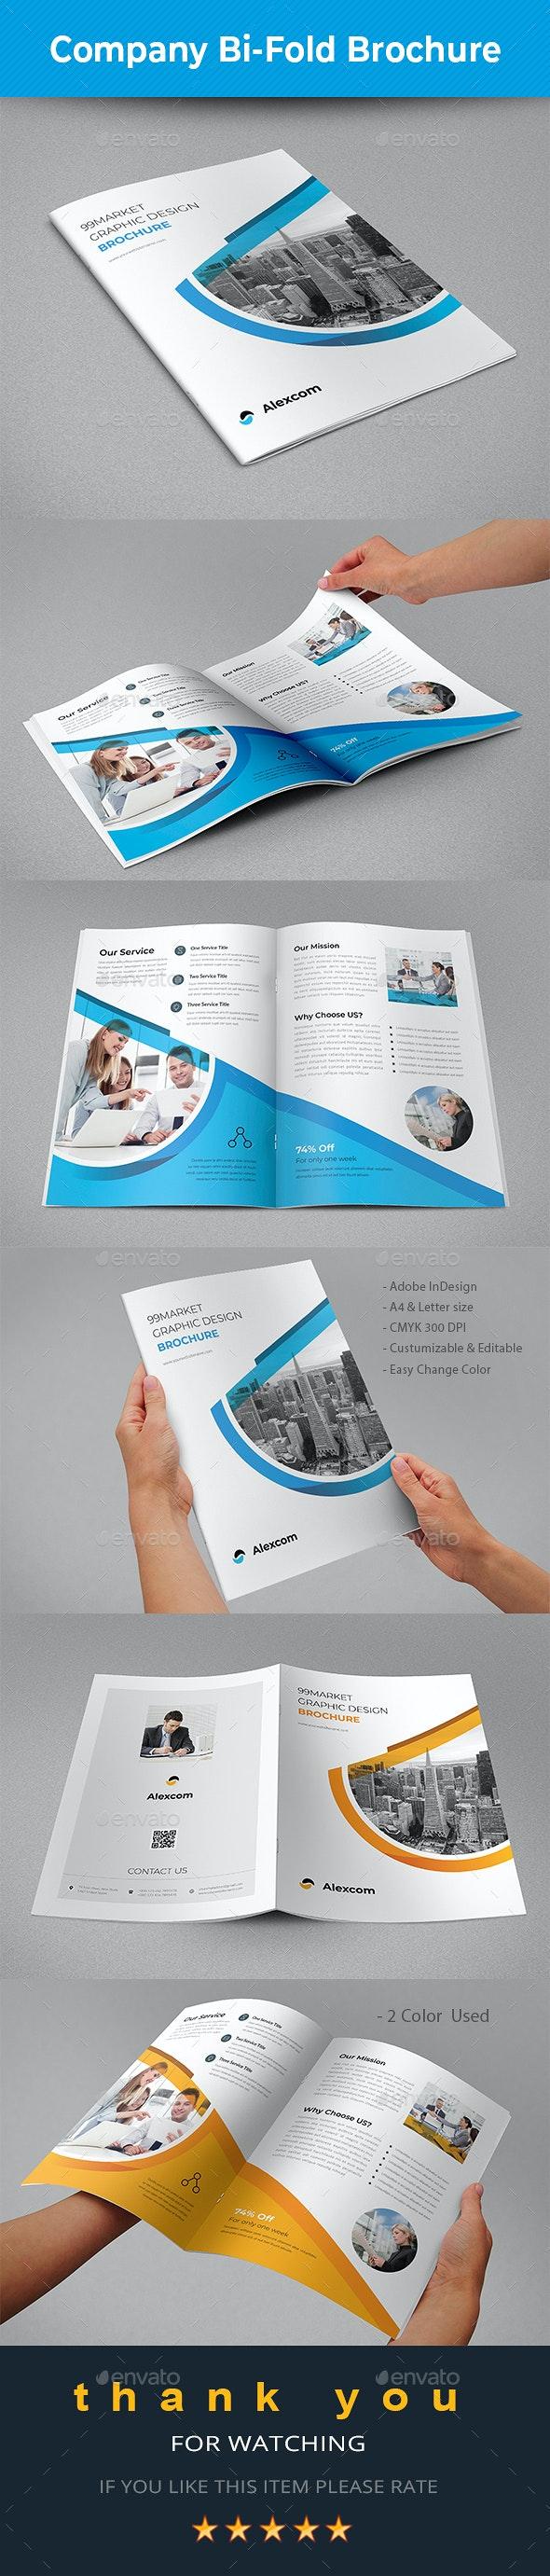 Company Bifold Brochure - Brochures Print Templates